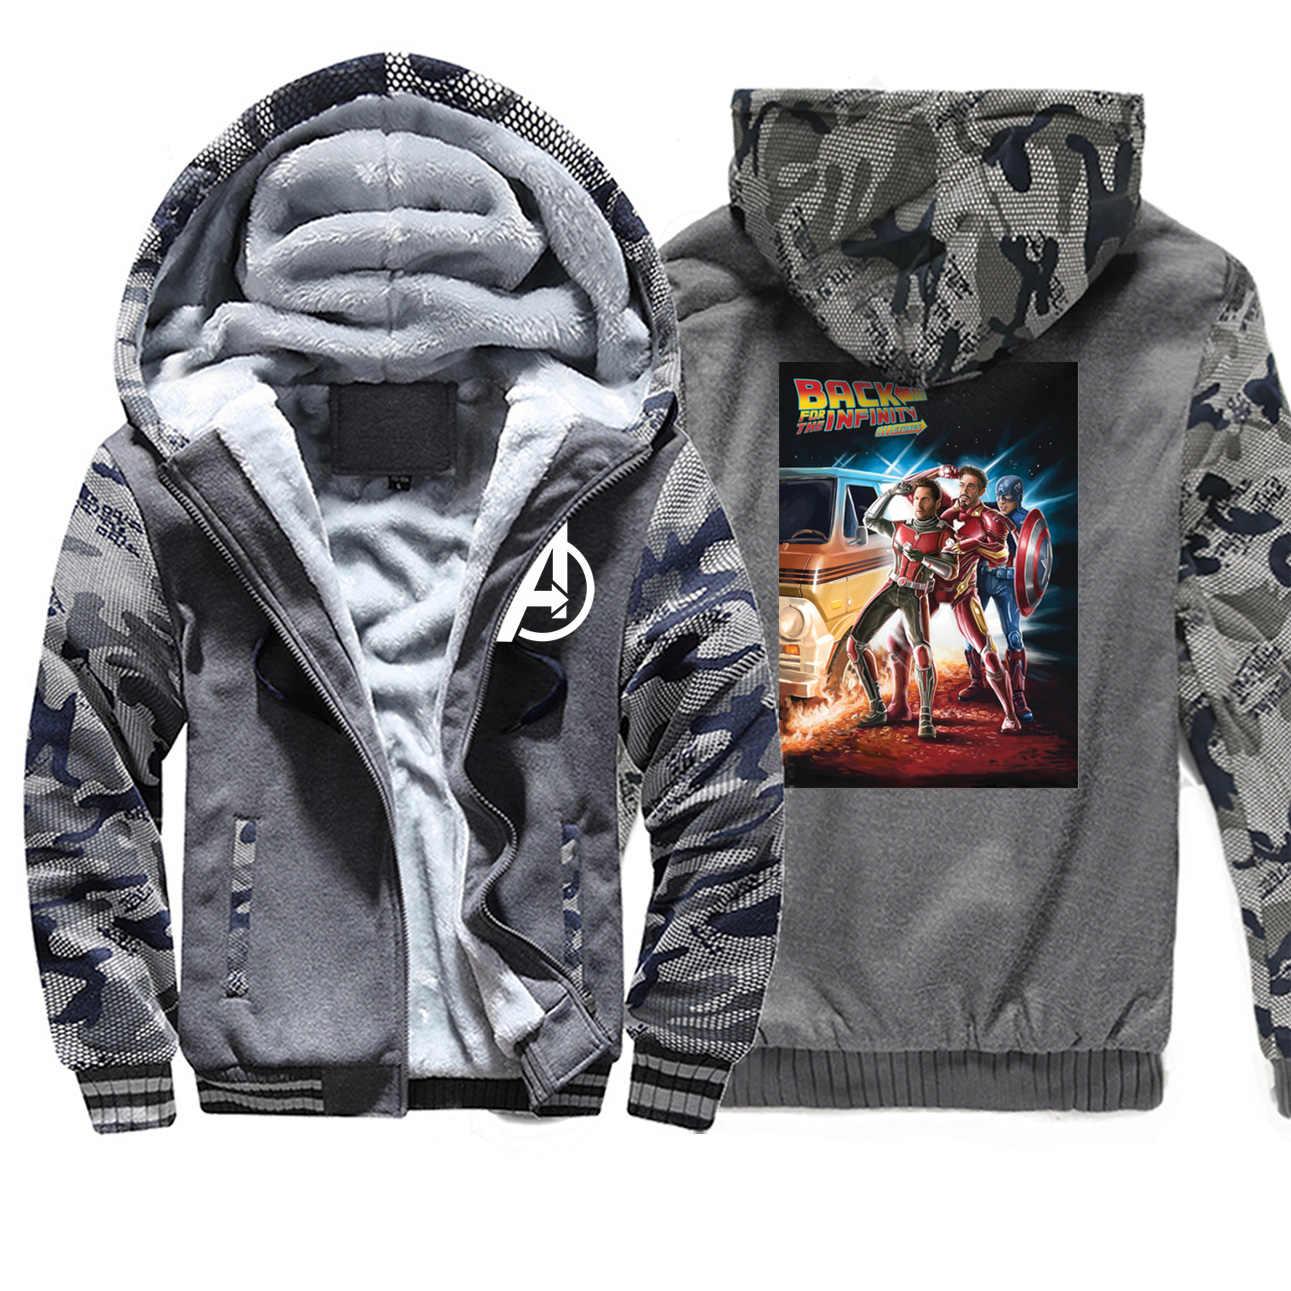 Zurück Zu Zukunft Winter Mäntel Männer Iron Man Avengers Ende Spiel Camo Mode Endgame Hoodies Sweatshirts Spinne Mann Marvel Streetwear